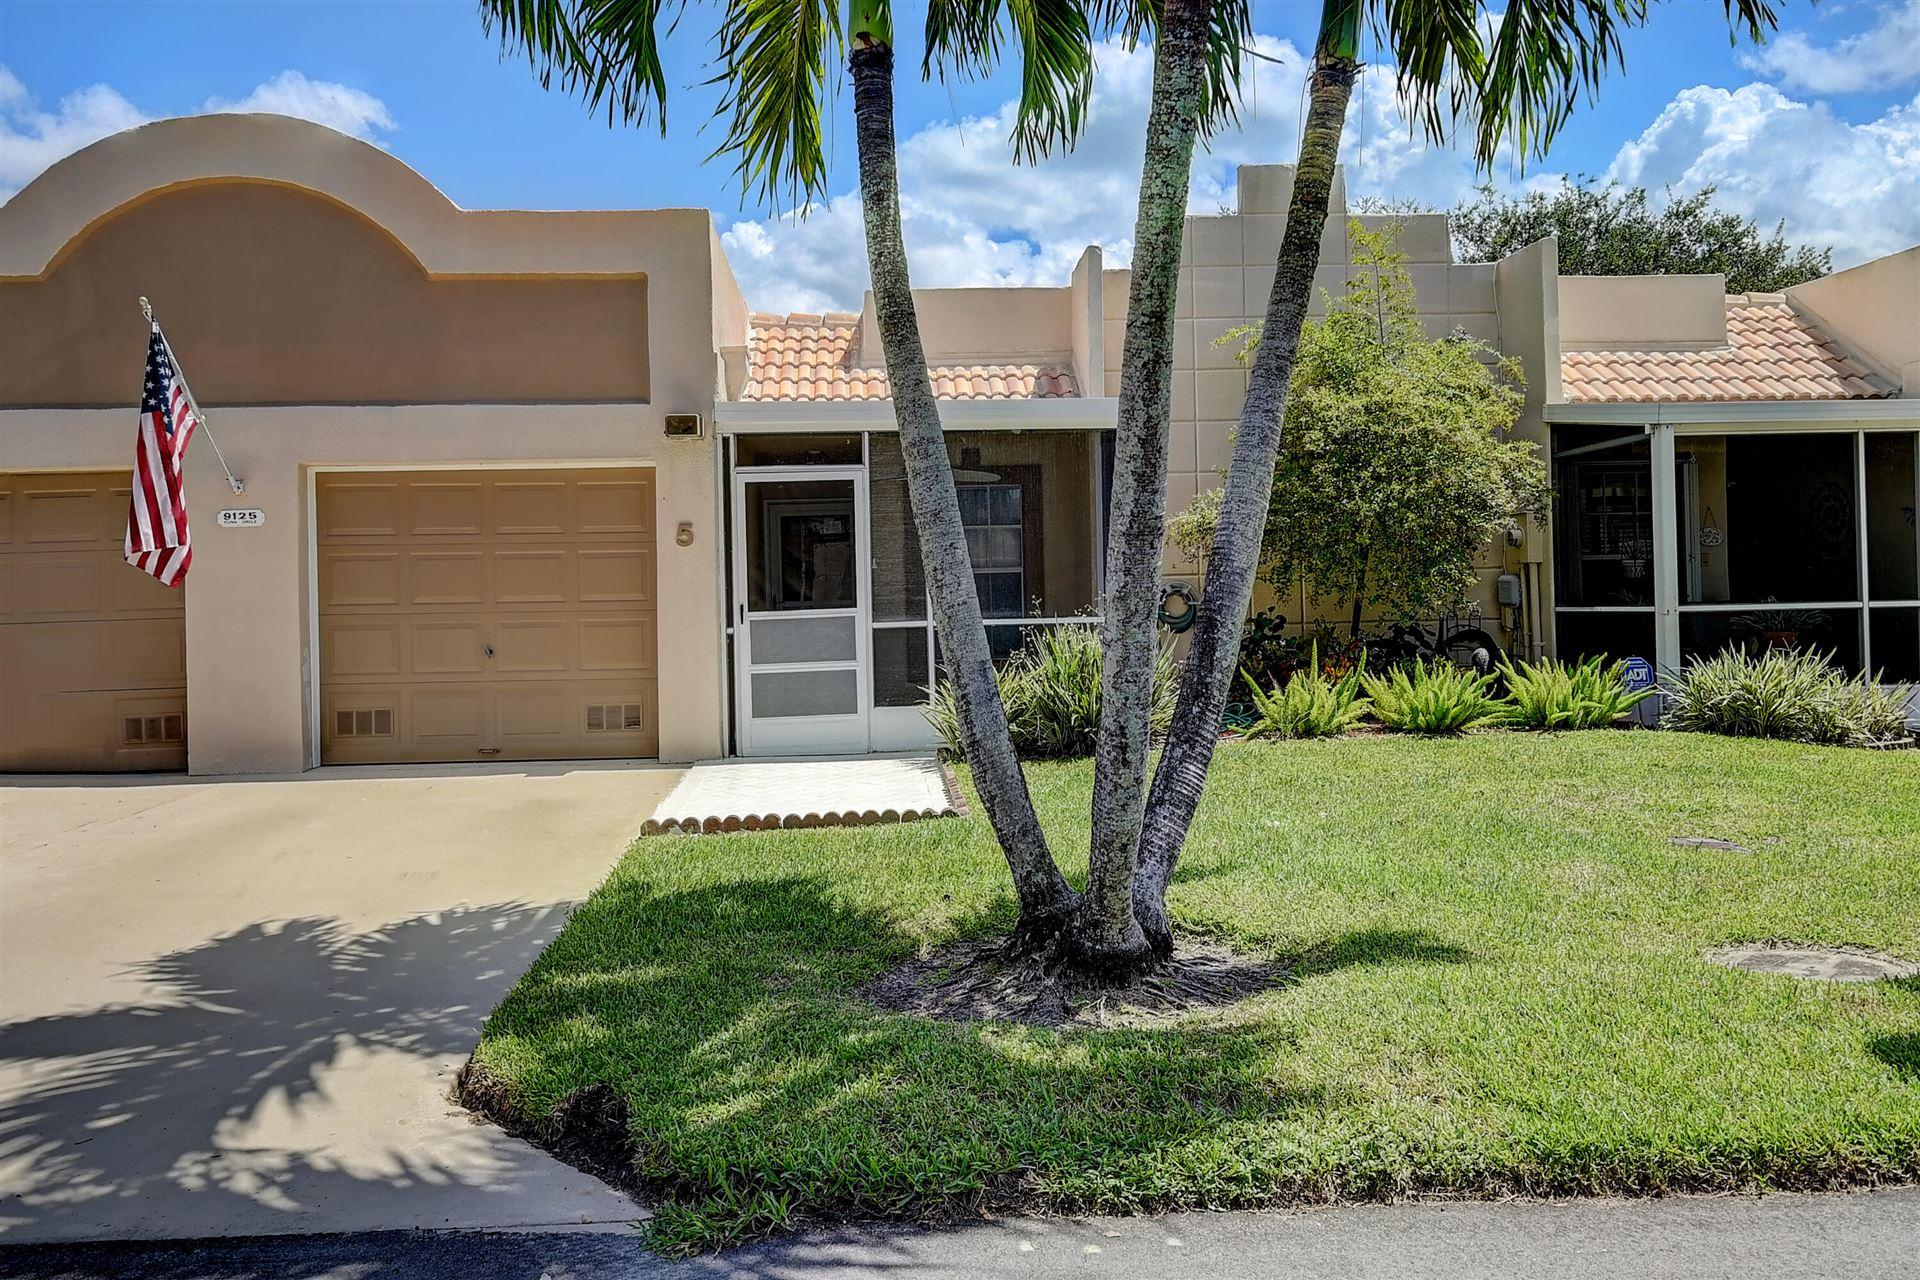 9125 Flynn Circle # 5, Boca Raton, FL 33496 - MLS#: RX-10745292